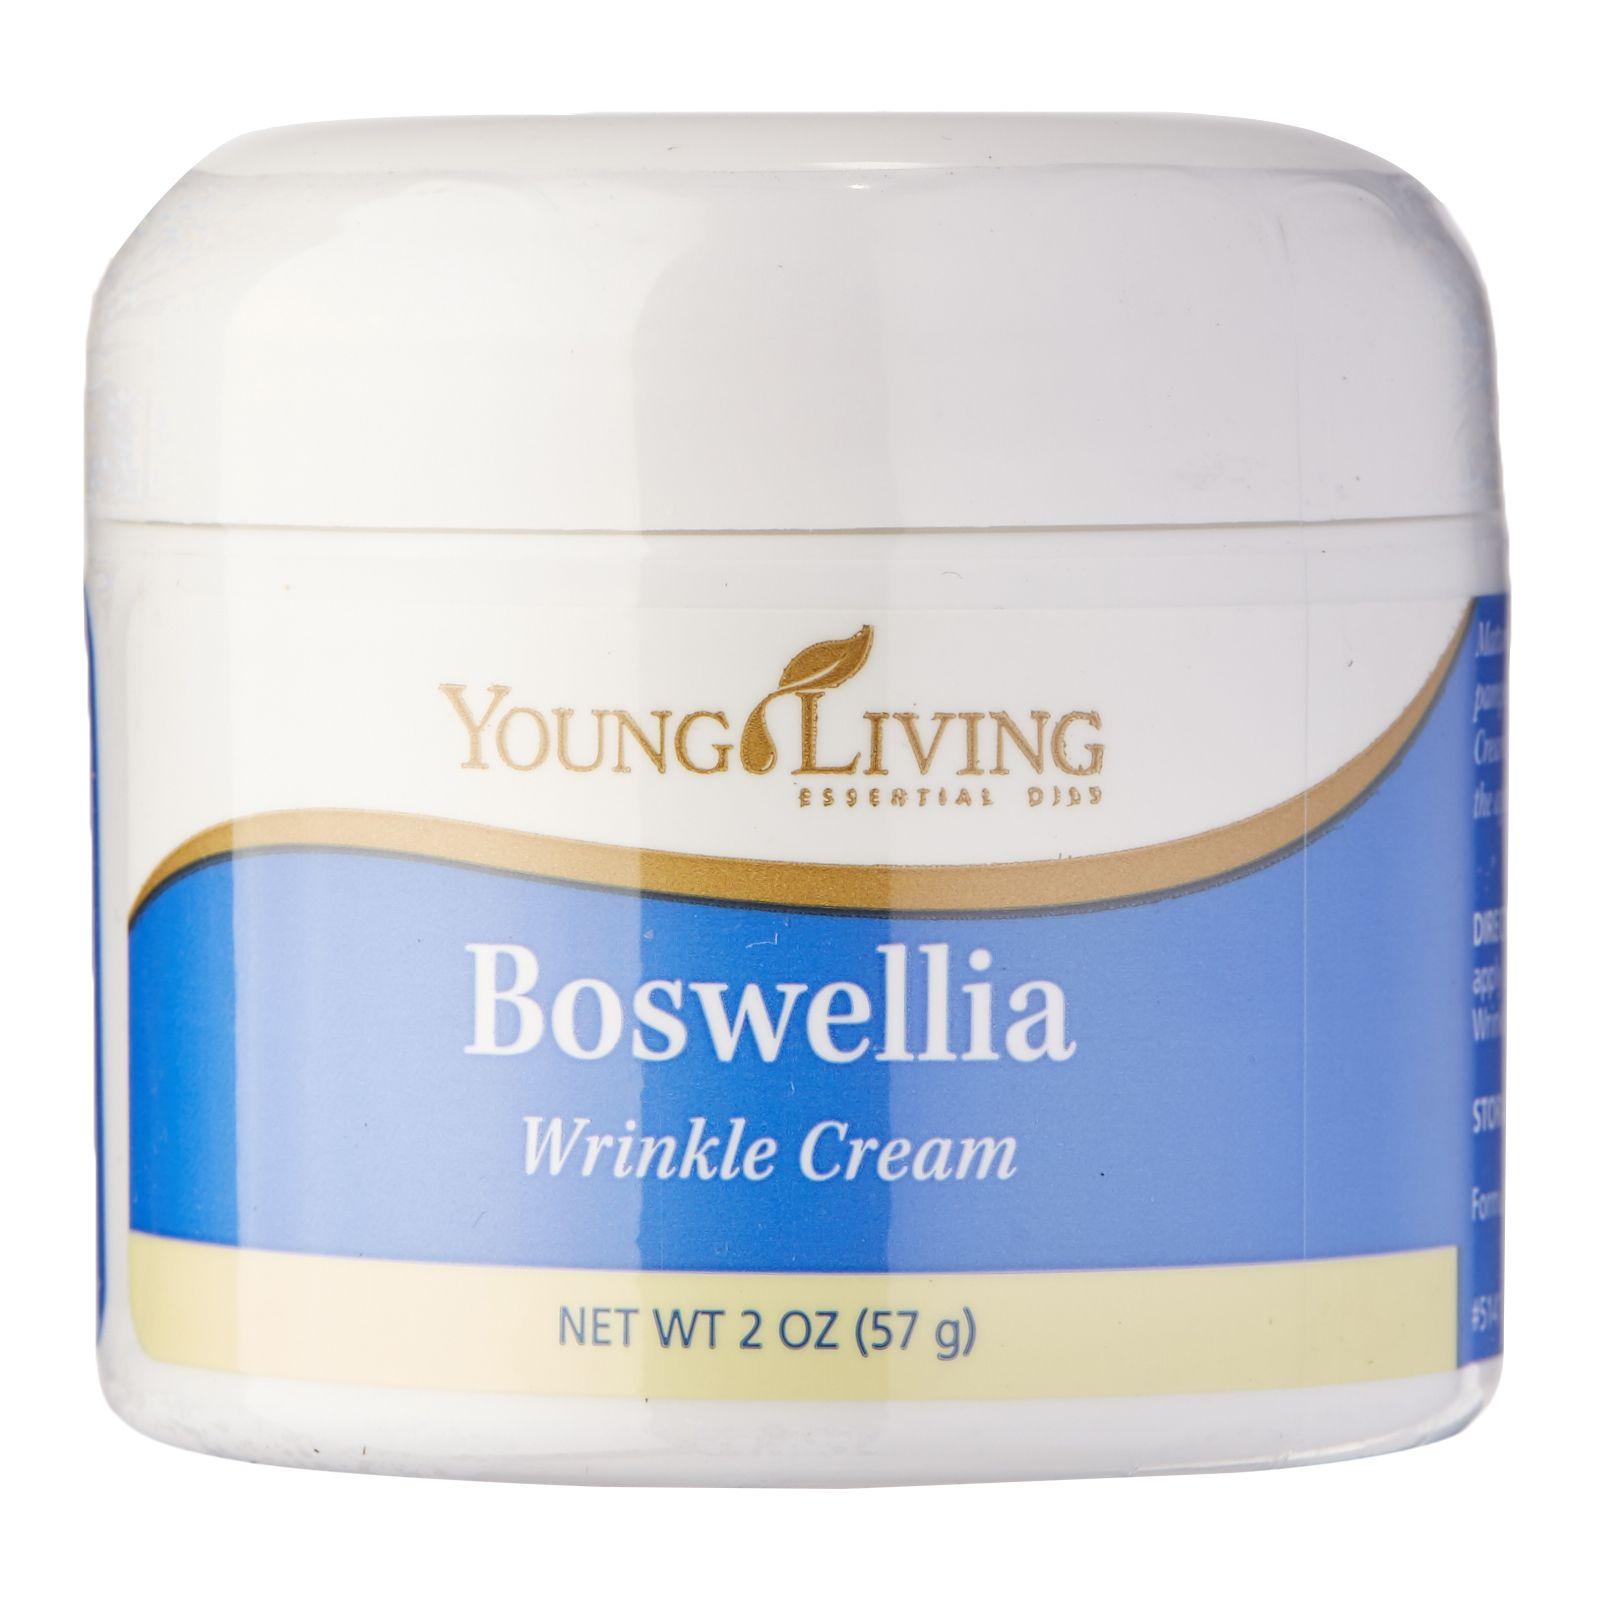 Young Living Boswellia Wrinkle Cream   RedMart